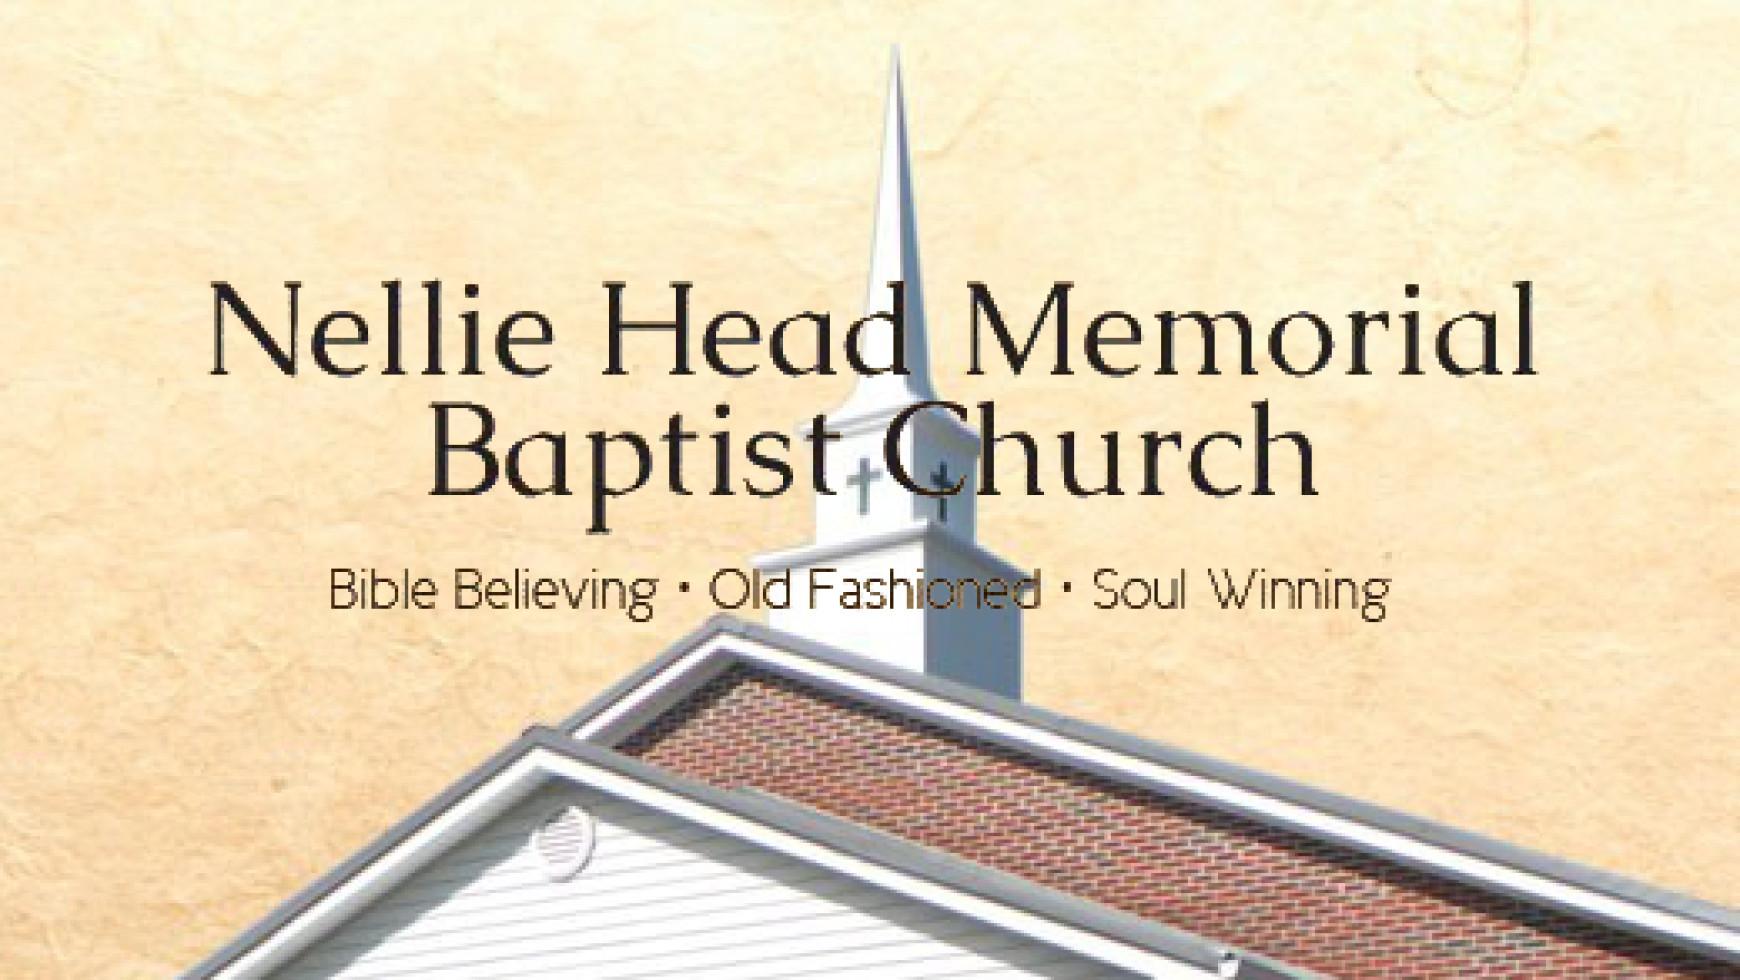 2017 November Meeting – Nellie Head Memorial Baptist Church in Tunnel Hill, GA